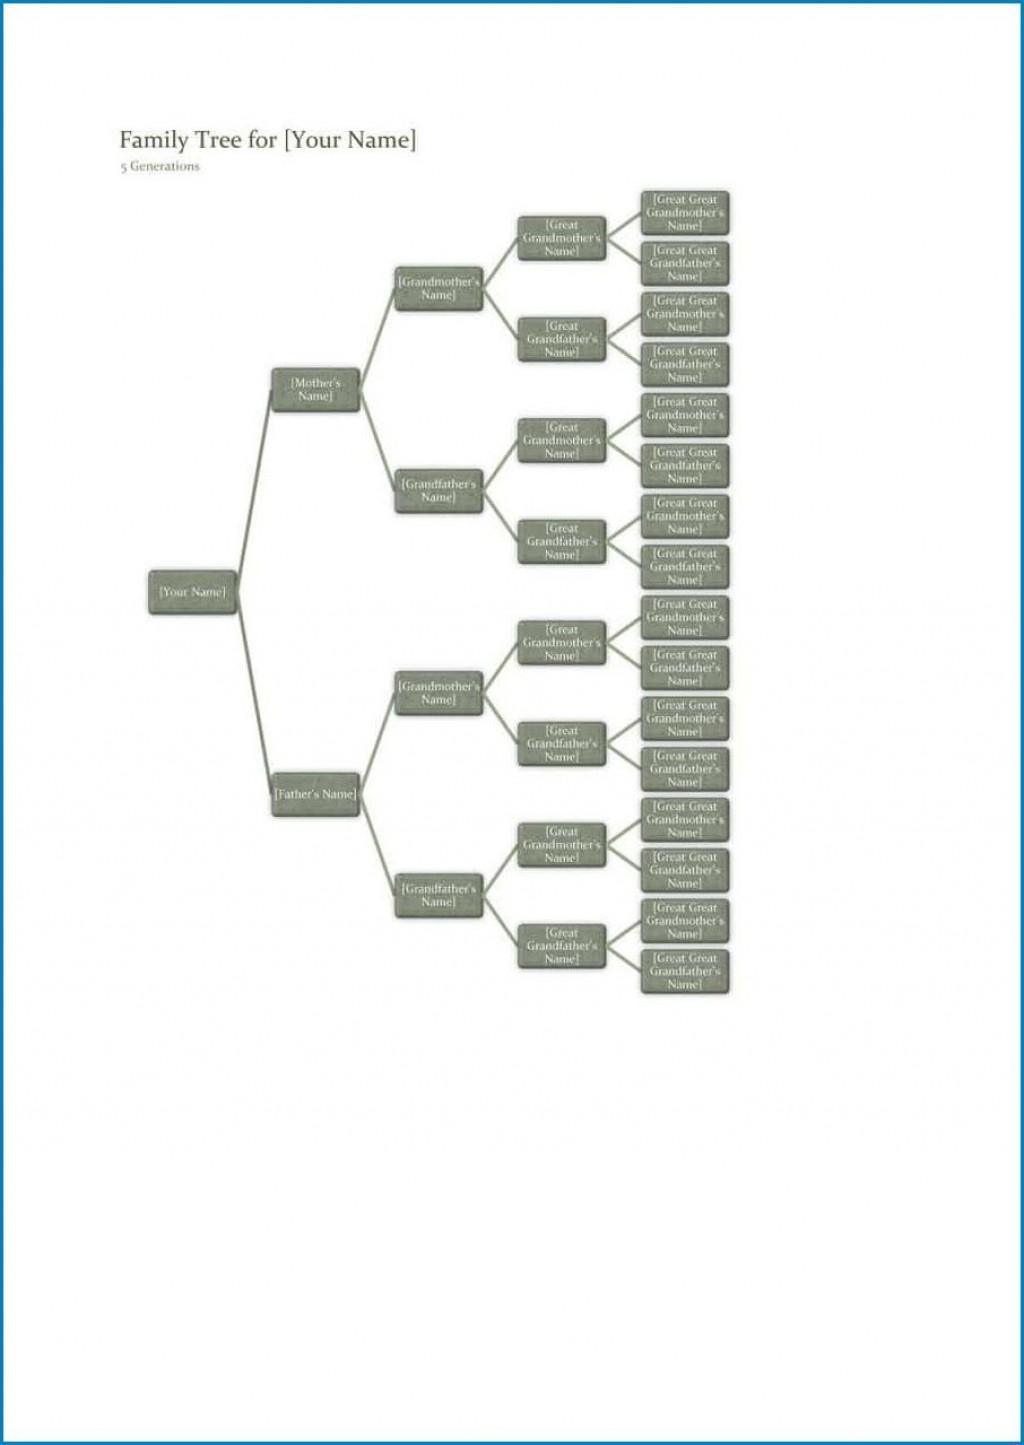 006 Stupendou Excel Family Tree Template Idea  7 Generation 4Large